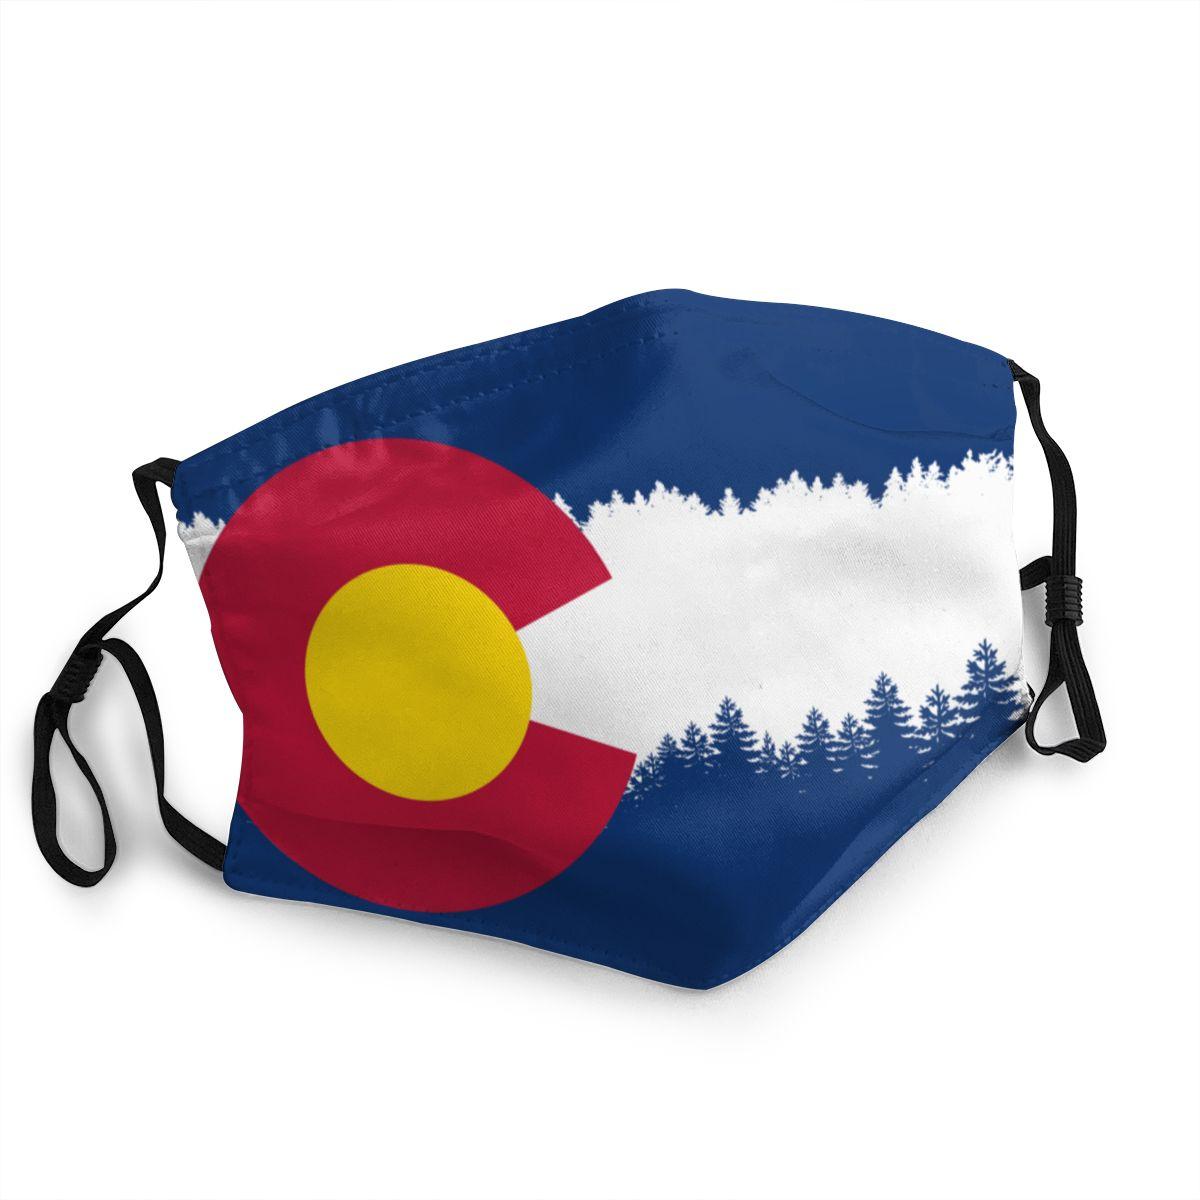 Colorado bandeira adulto reutilizável máscara facial impresso anti haze dustproof máscara de proteção respirador boca muffle